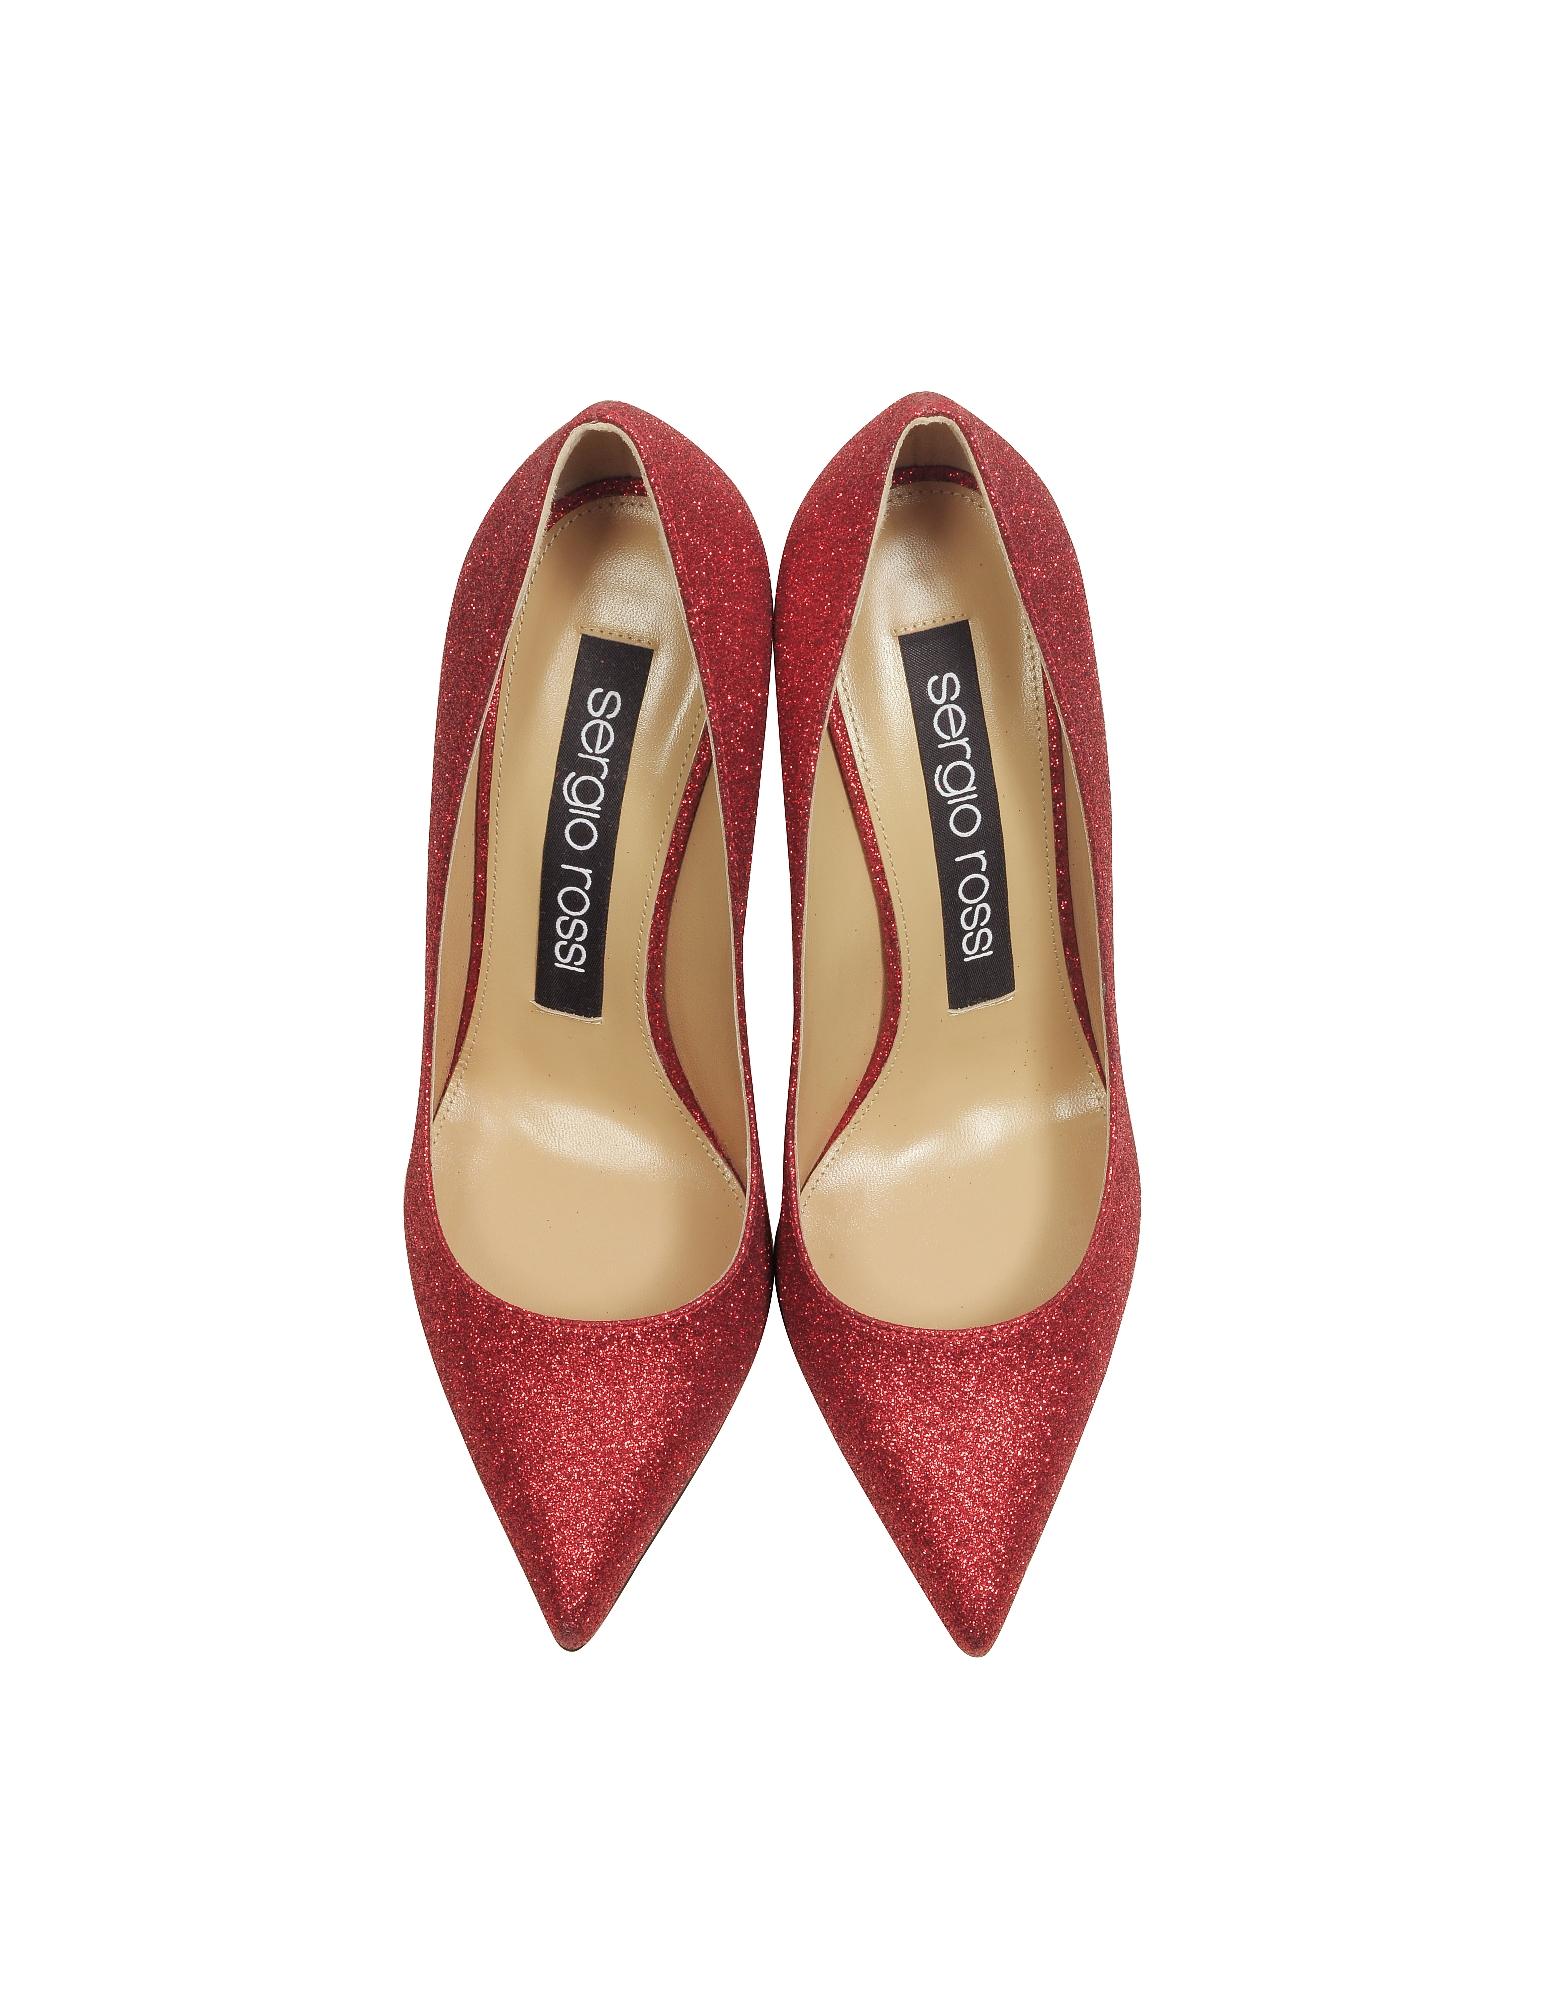 Sergio Rossi | Glitterama - Туфли Лодочки Оттенка Красный Кармин | Clouty